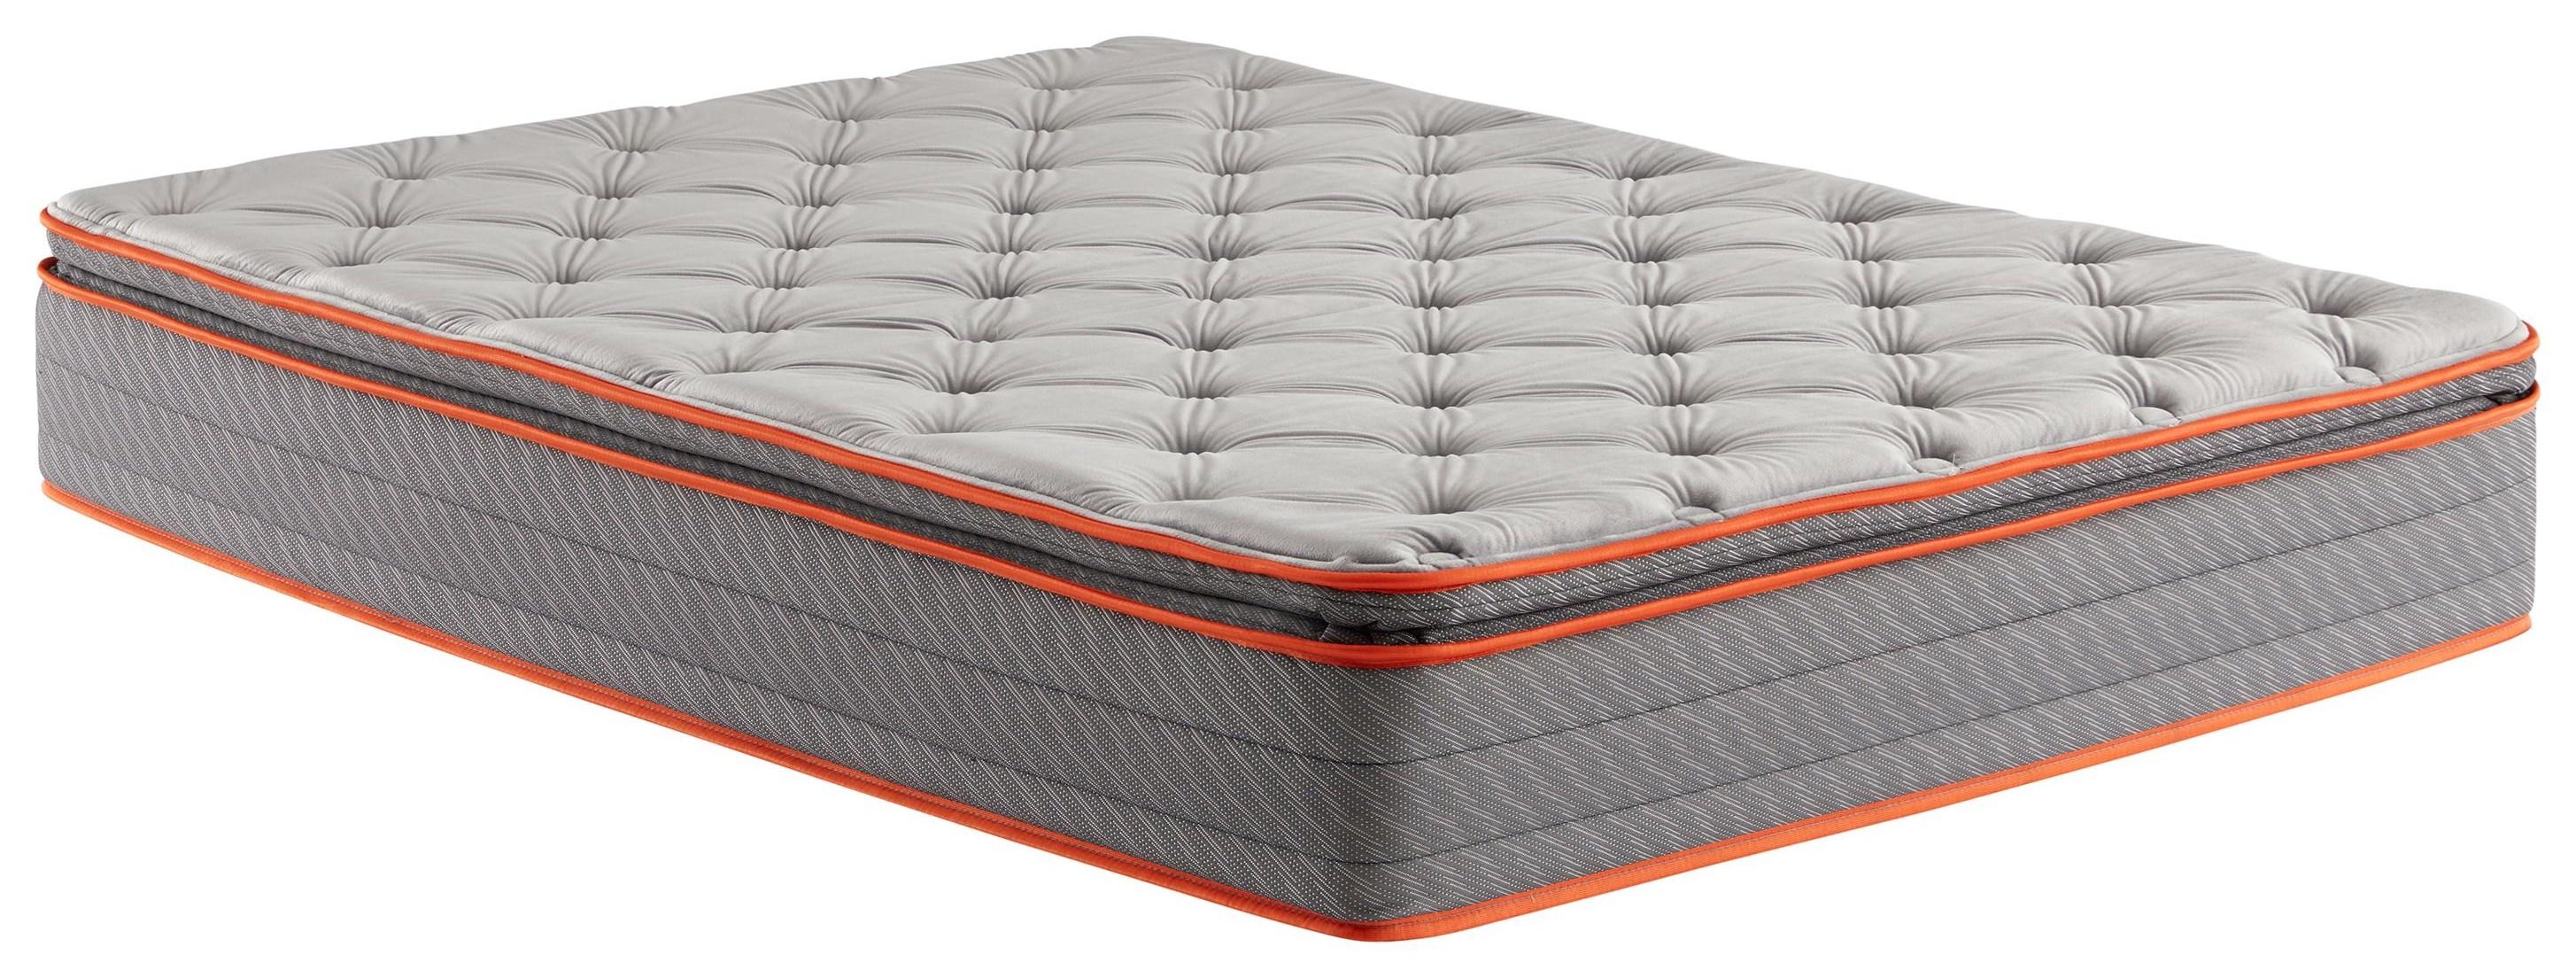 Land Park Cal King Medium Firm Pillow Top Mattress by Corsicana at Beck's Furniture